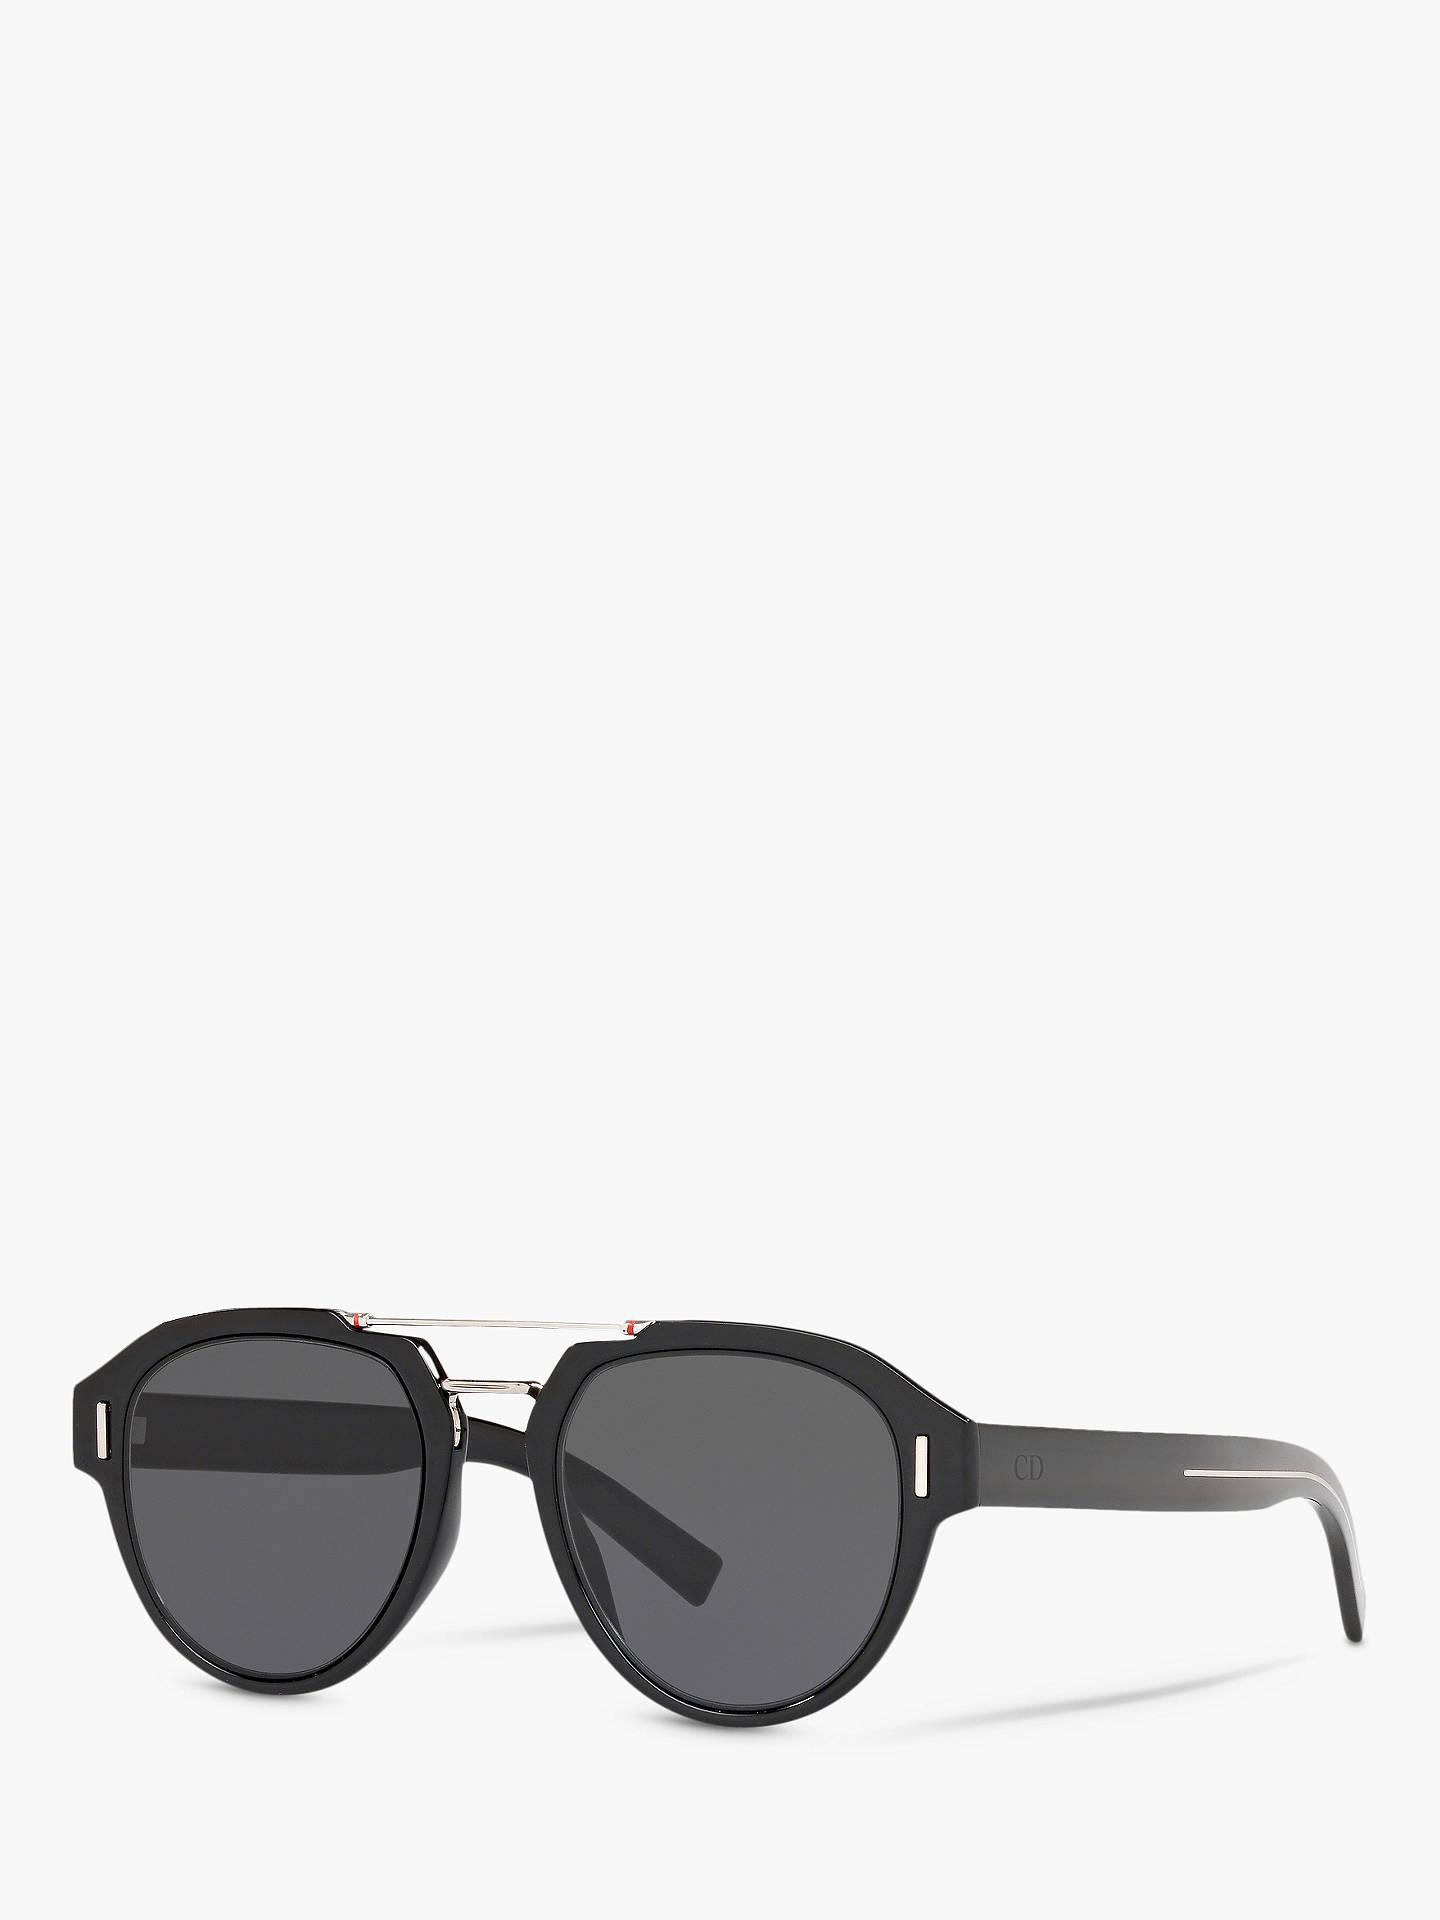 deb6ad8ce857 Buy Dior DiorFraction50 Women's Aviator Sunglasses, Black/Grey Online at  johnlewis. ...